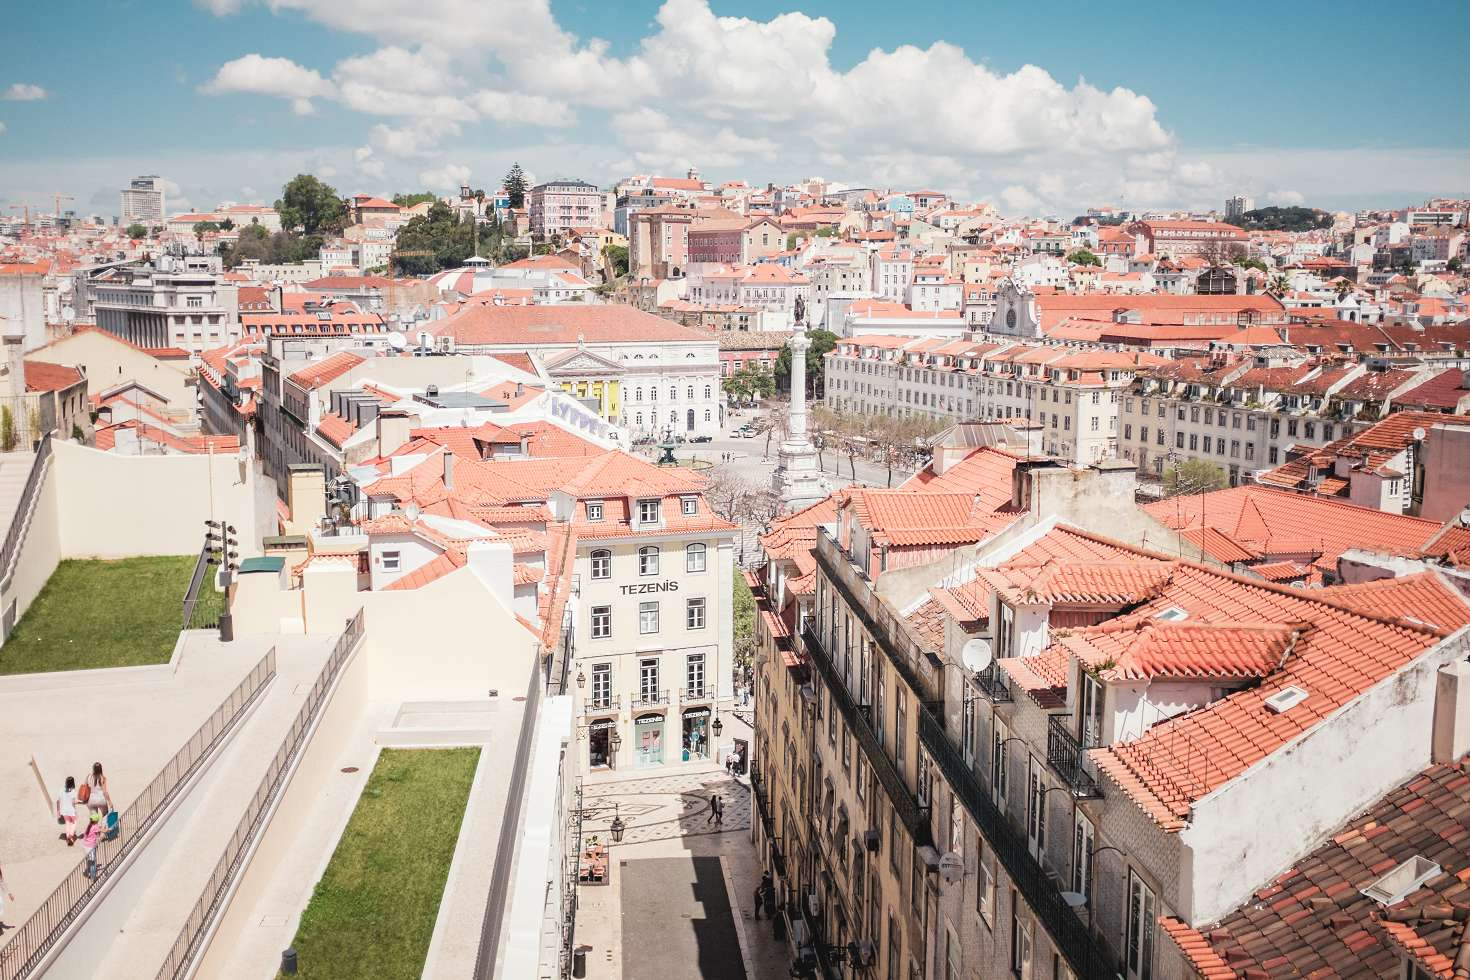 Valencia-Lissabon-Vigo-Stonehenge (30)